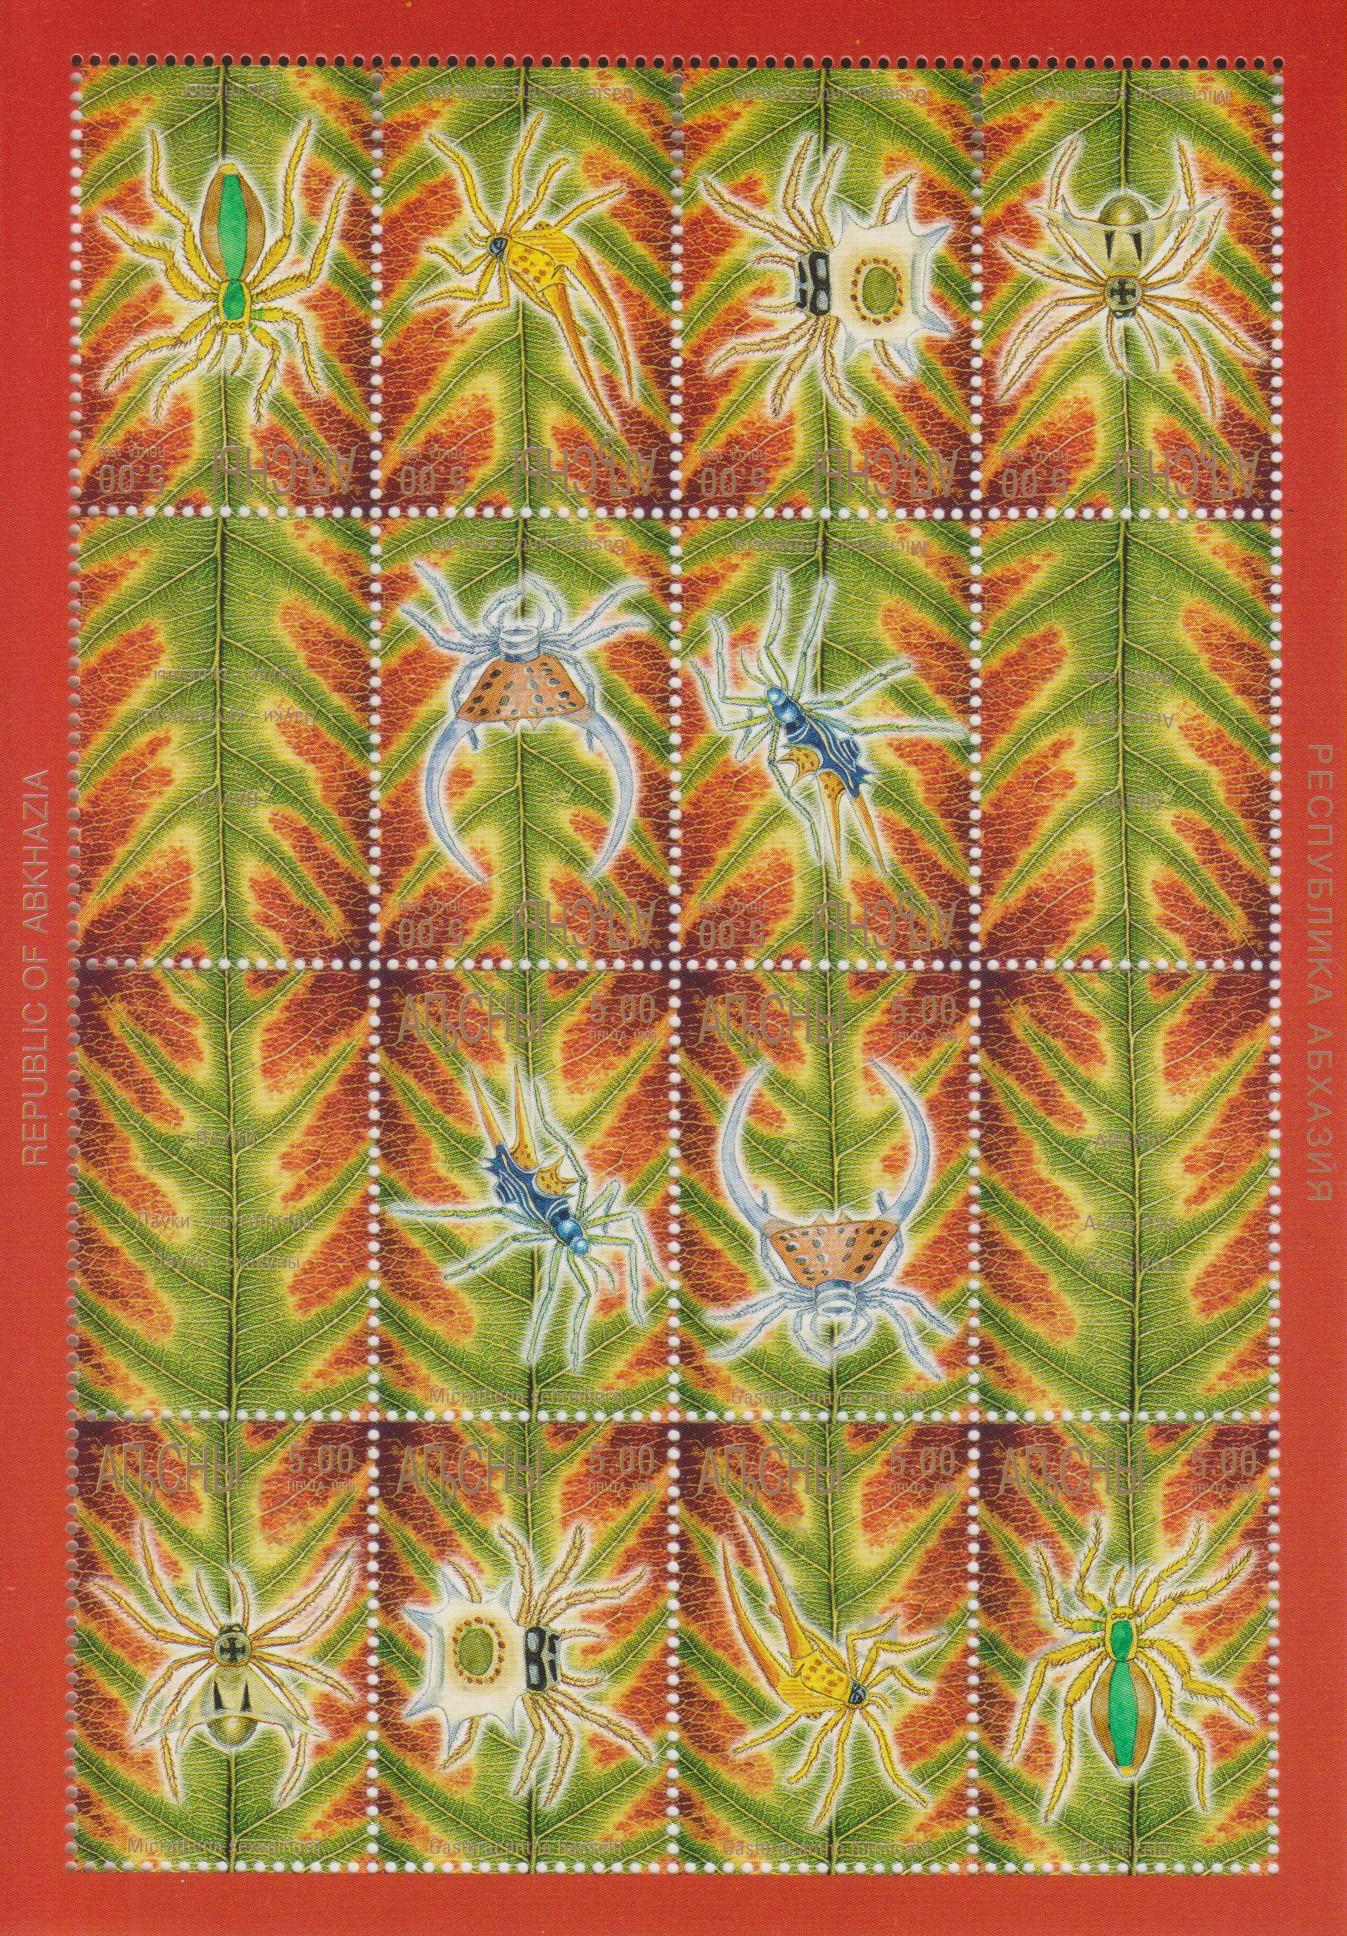 Abkhasie - Insectes - Feuillet neuf **